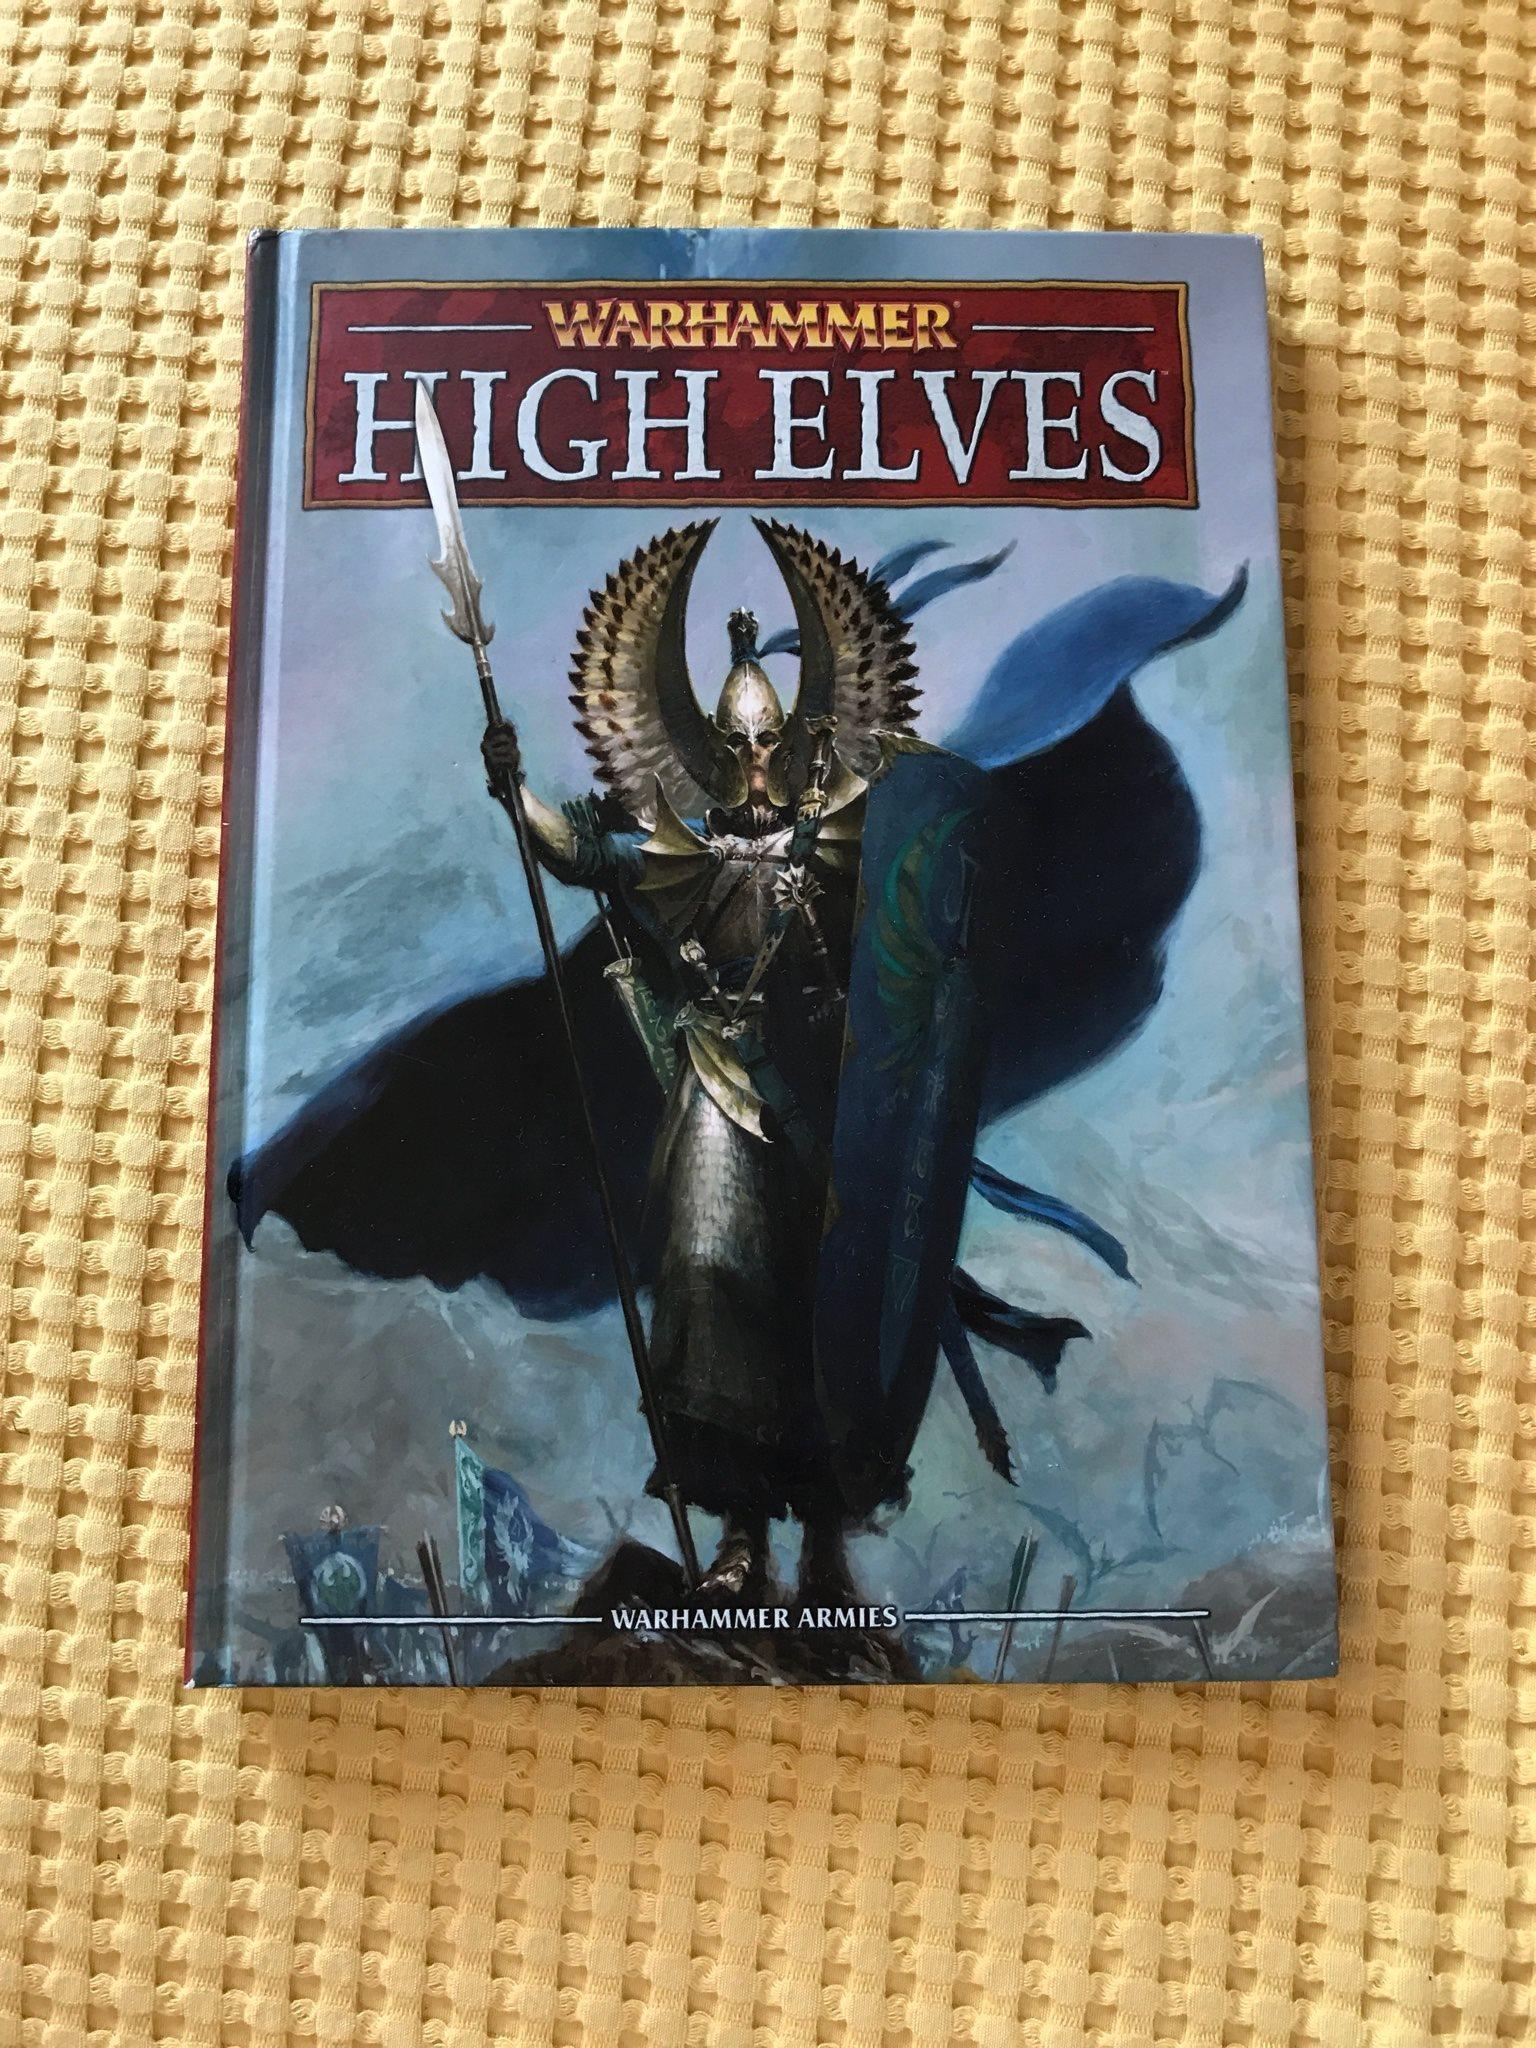 Warhammer High Elves Army Book